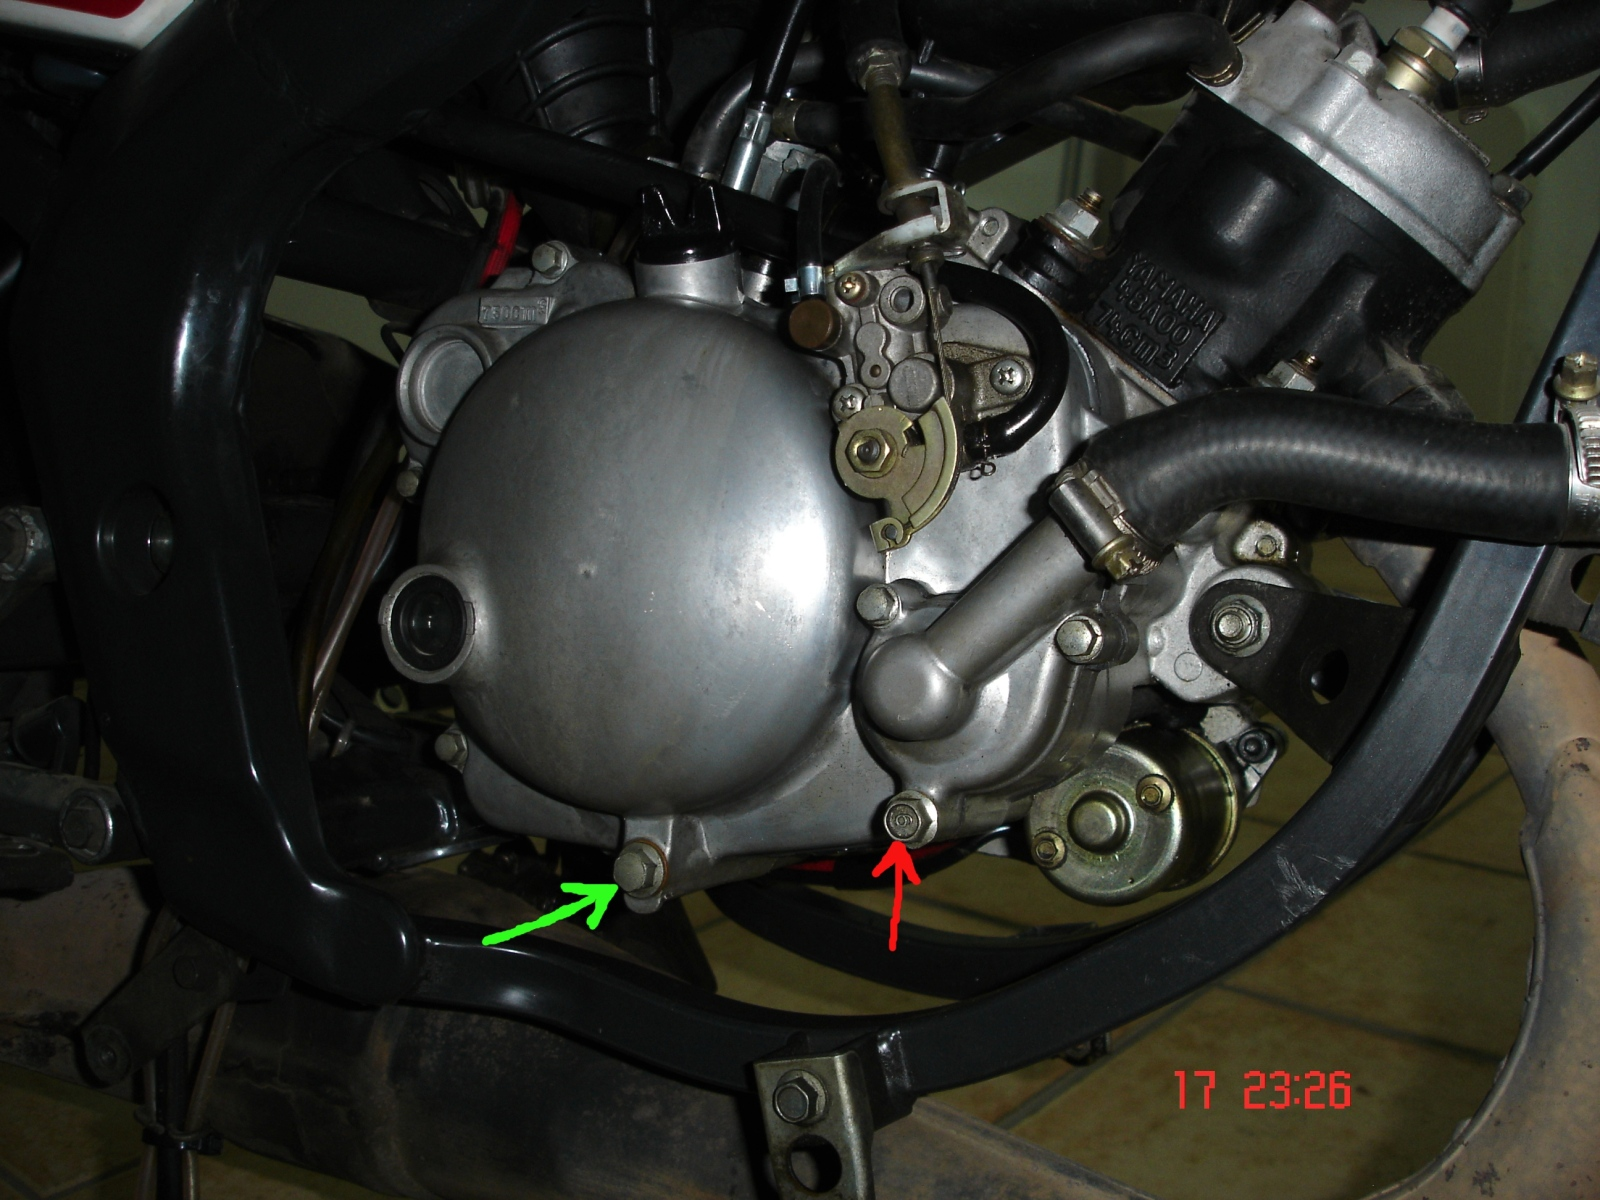 Fuga de aceite en Yamaha TZR 80 RR 5a00oj